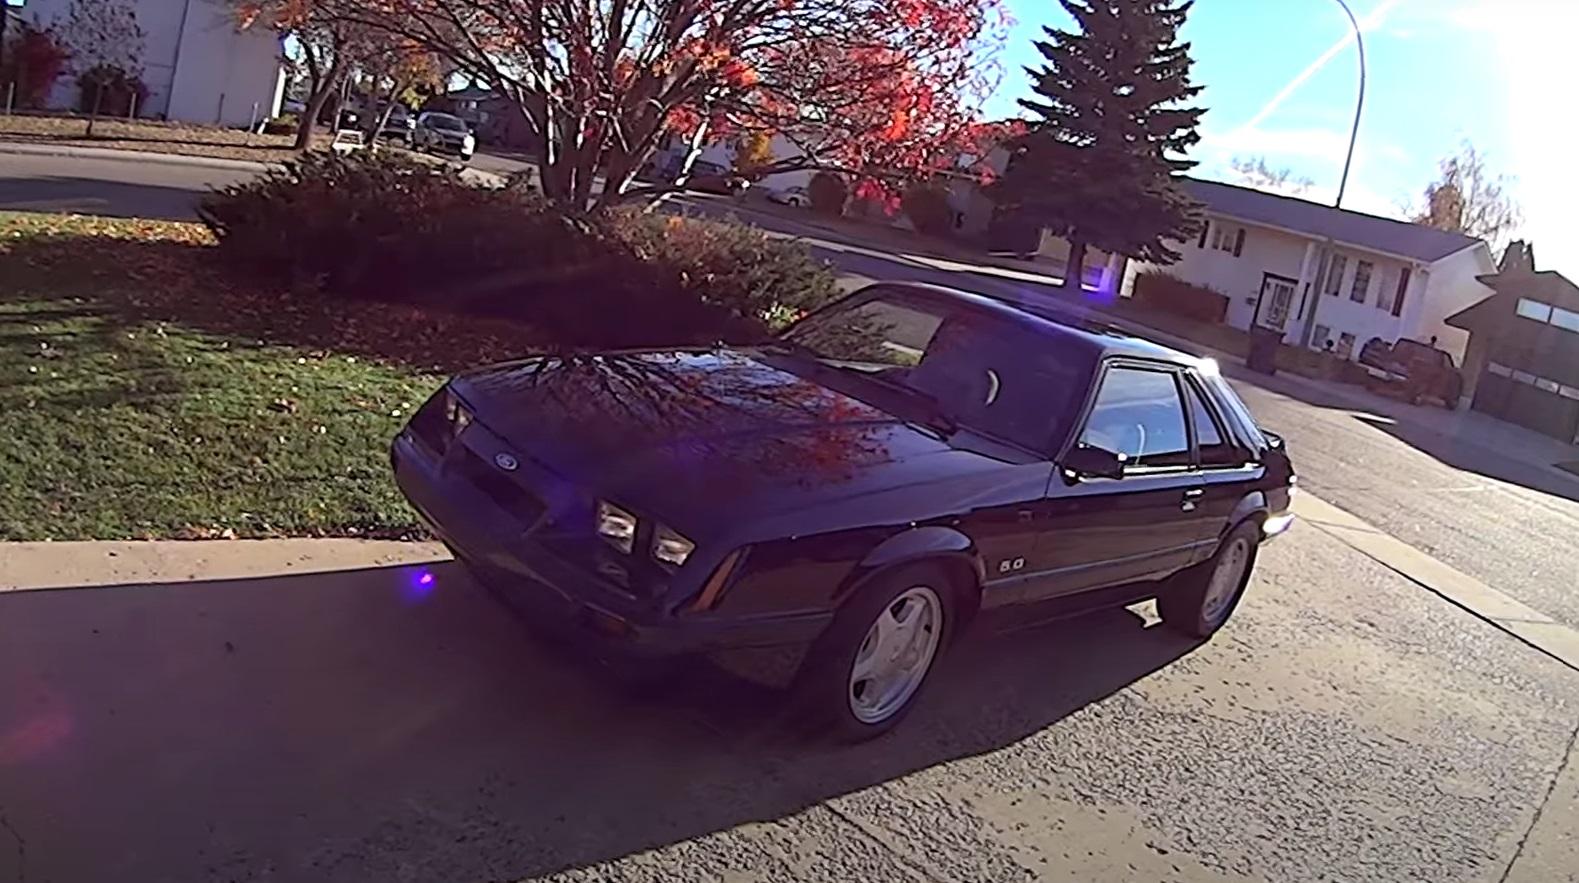 Video: 1985 Ford Mustang 1985 Fox Body Walkaround + Startup